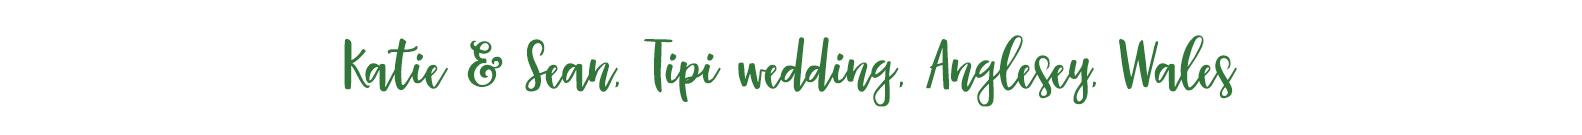 Kate and Sean Tipi Wedding Anglesey Wales Wedding Photographer.jpg